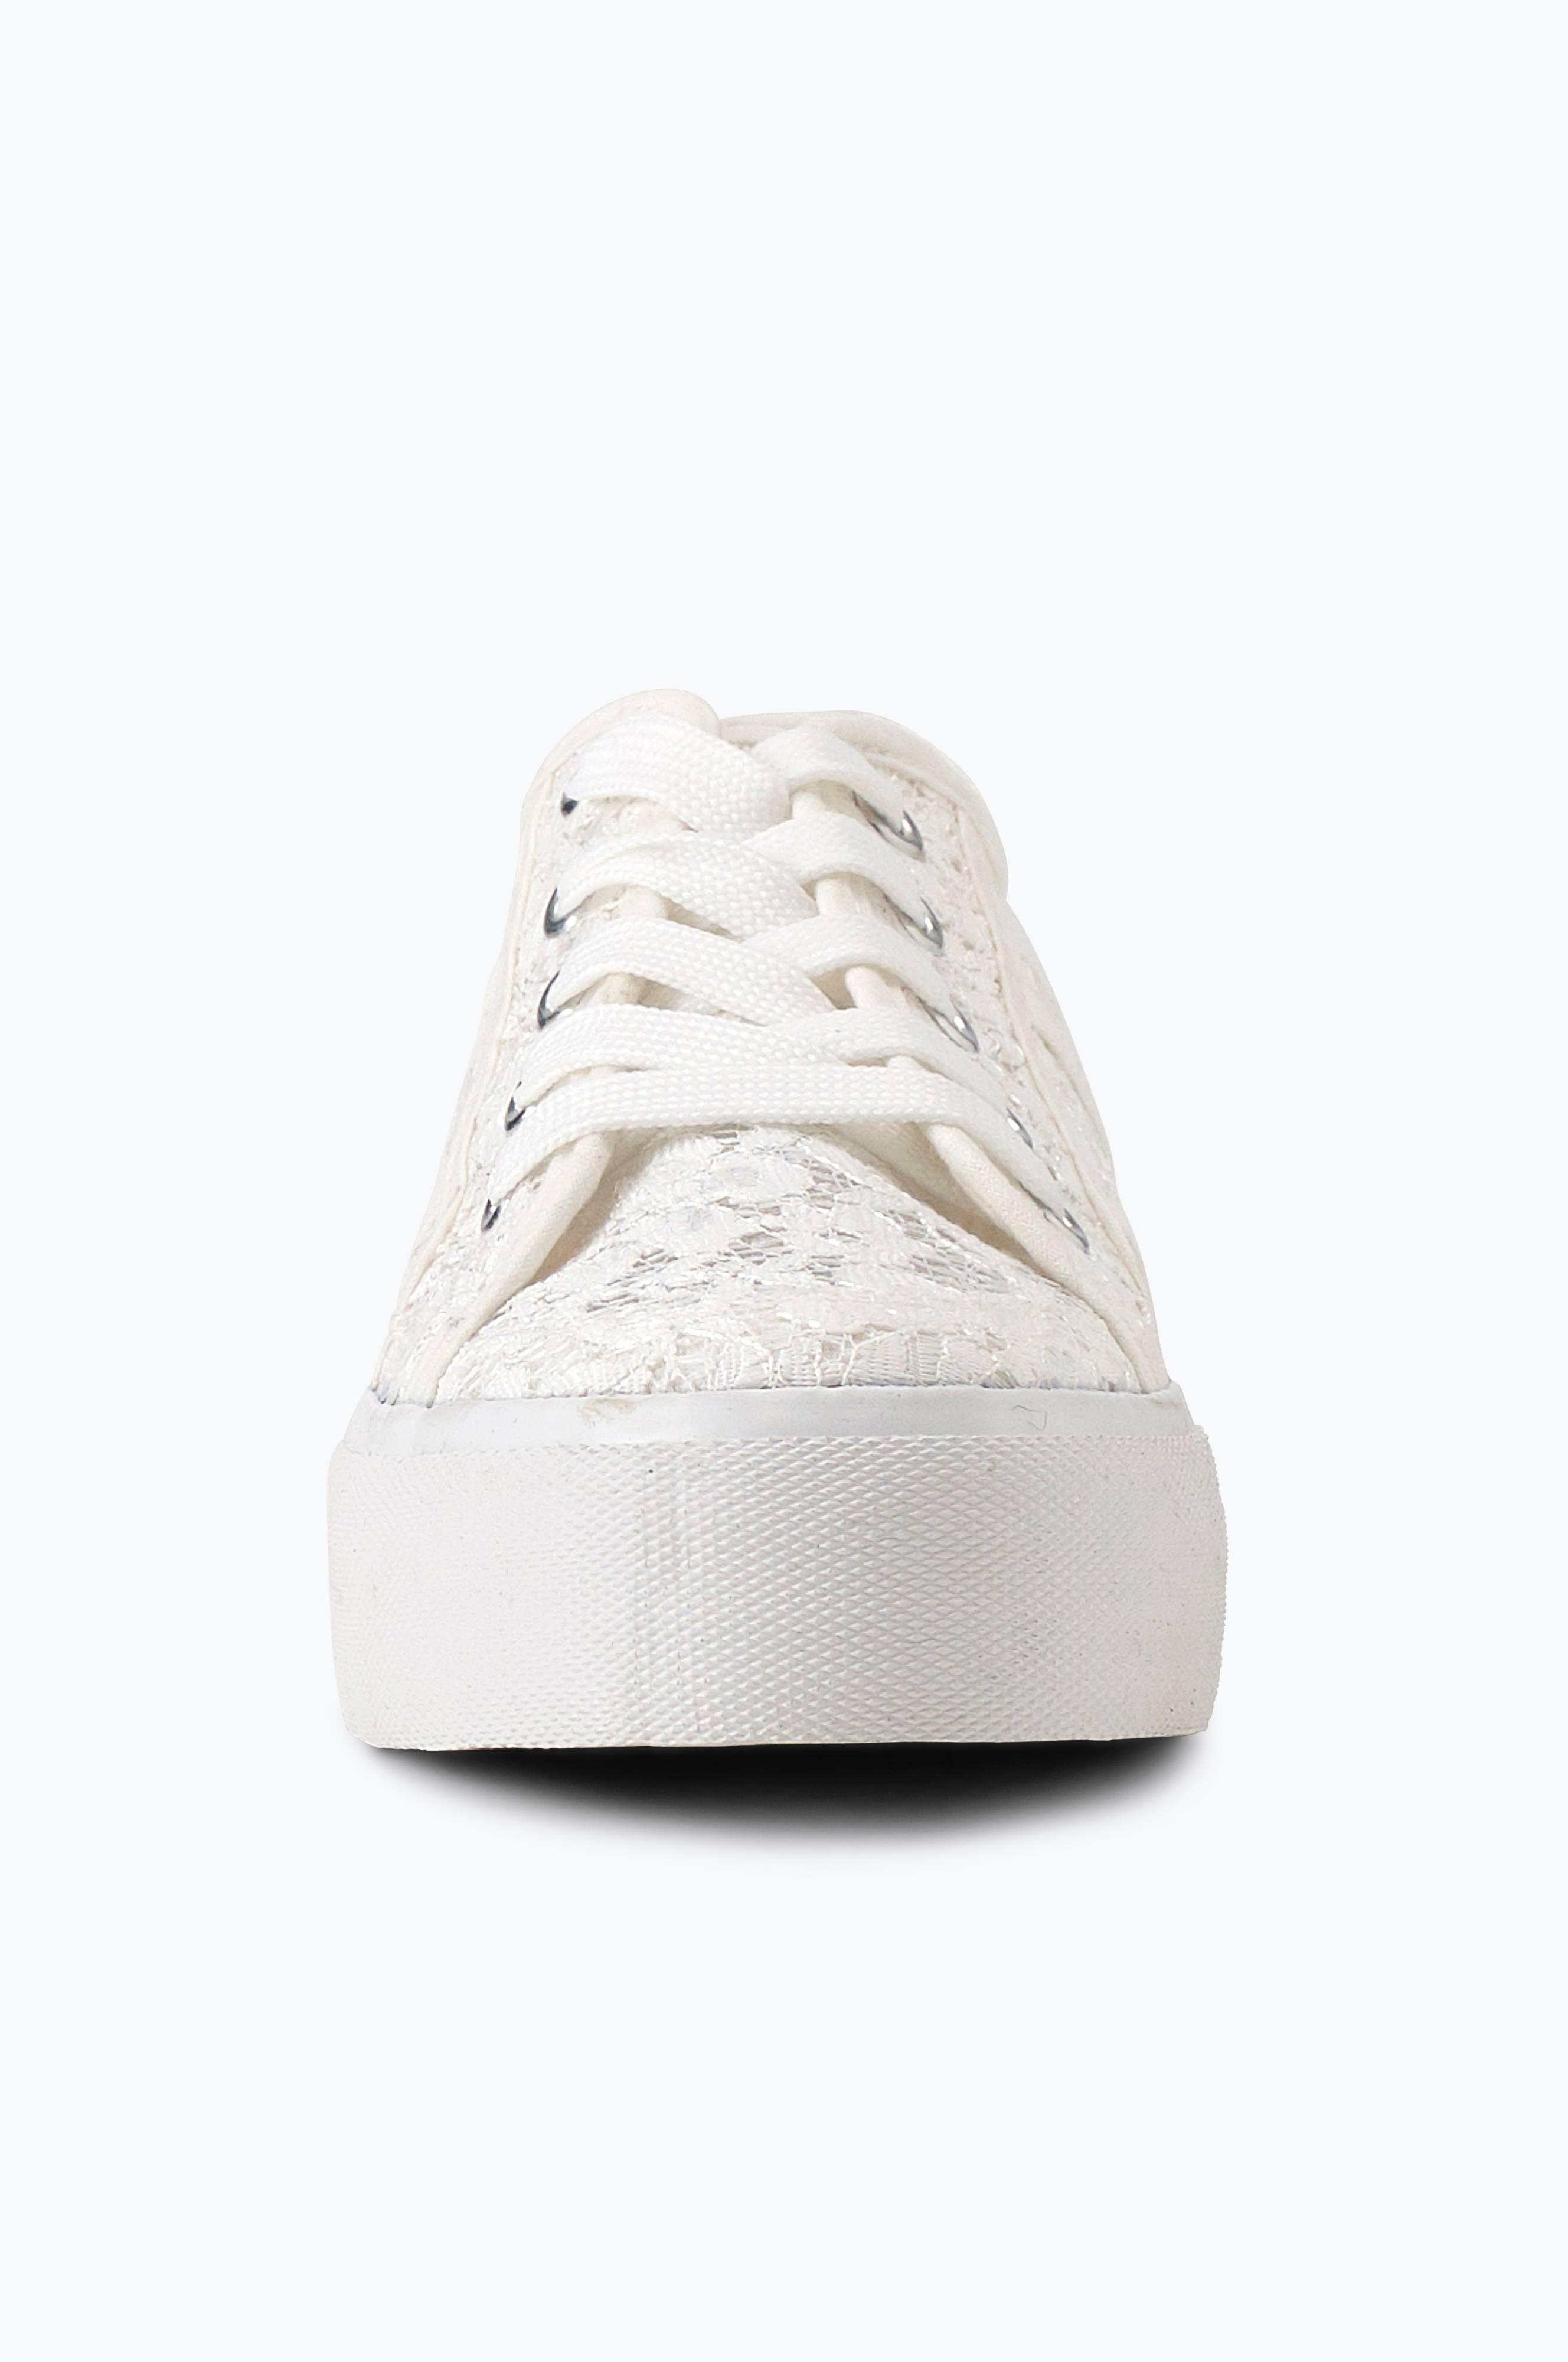 Ellos Shoes Sneakers Barbro Vit Dam Ellos.se